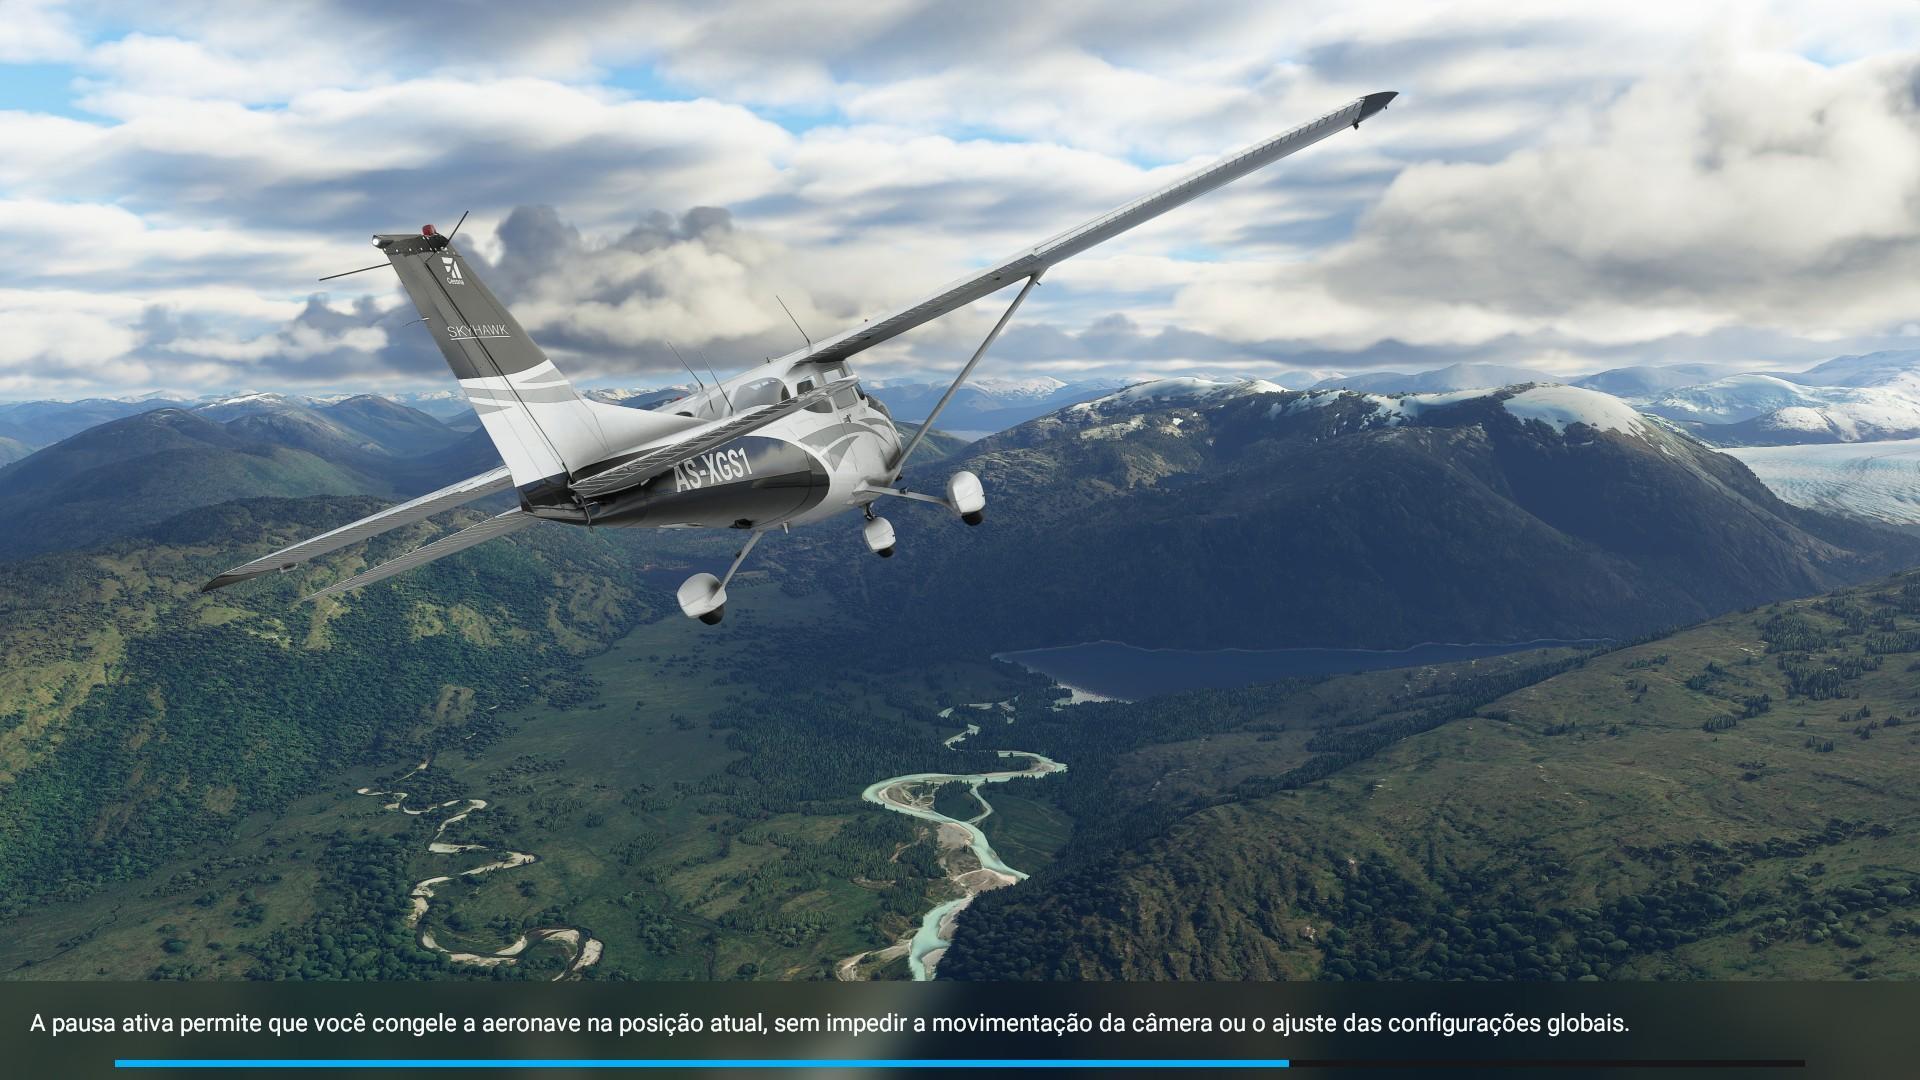 Pausa Ativa - Flight Simulator